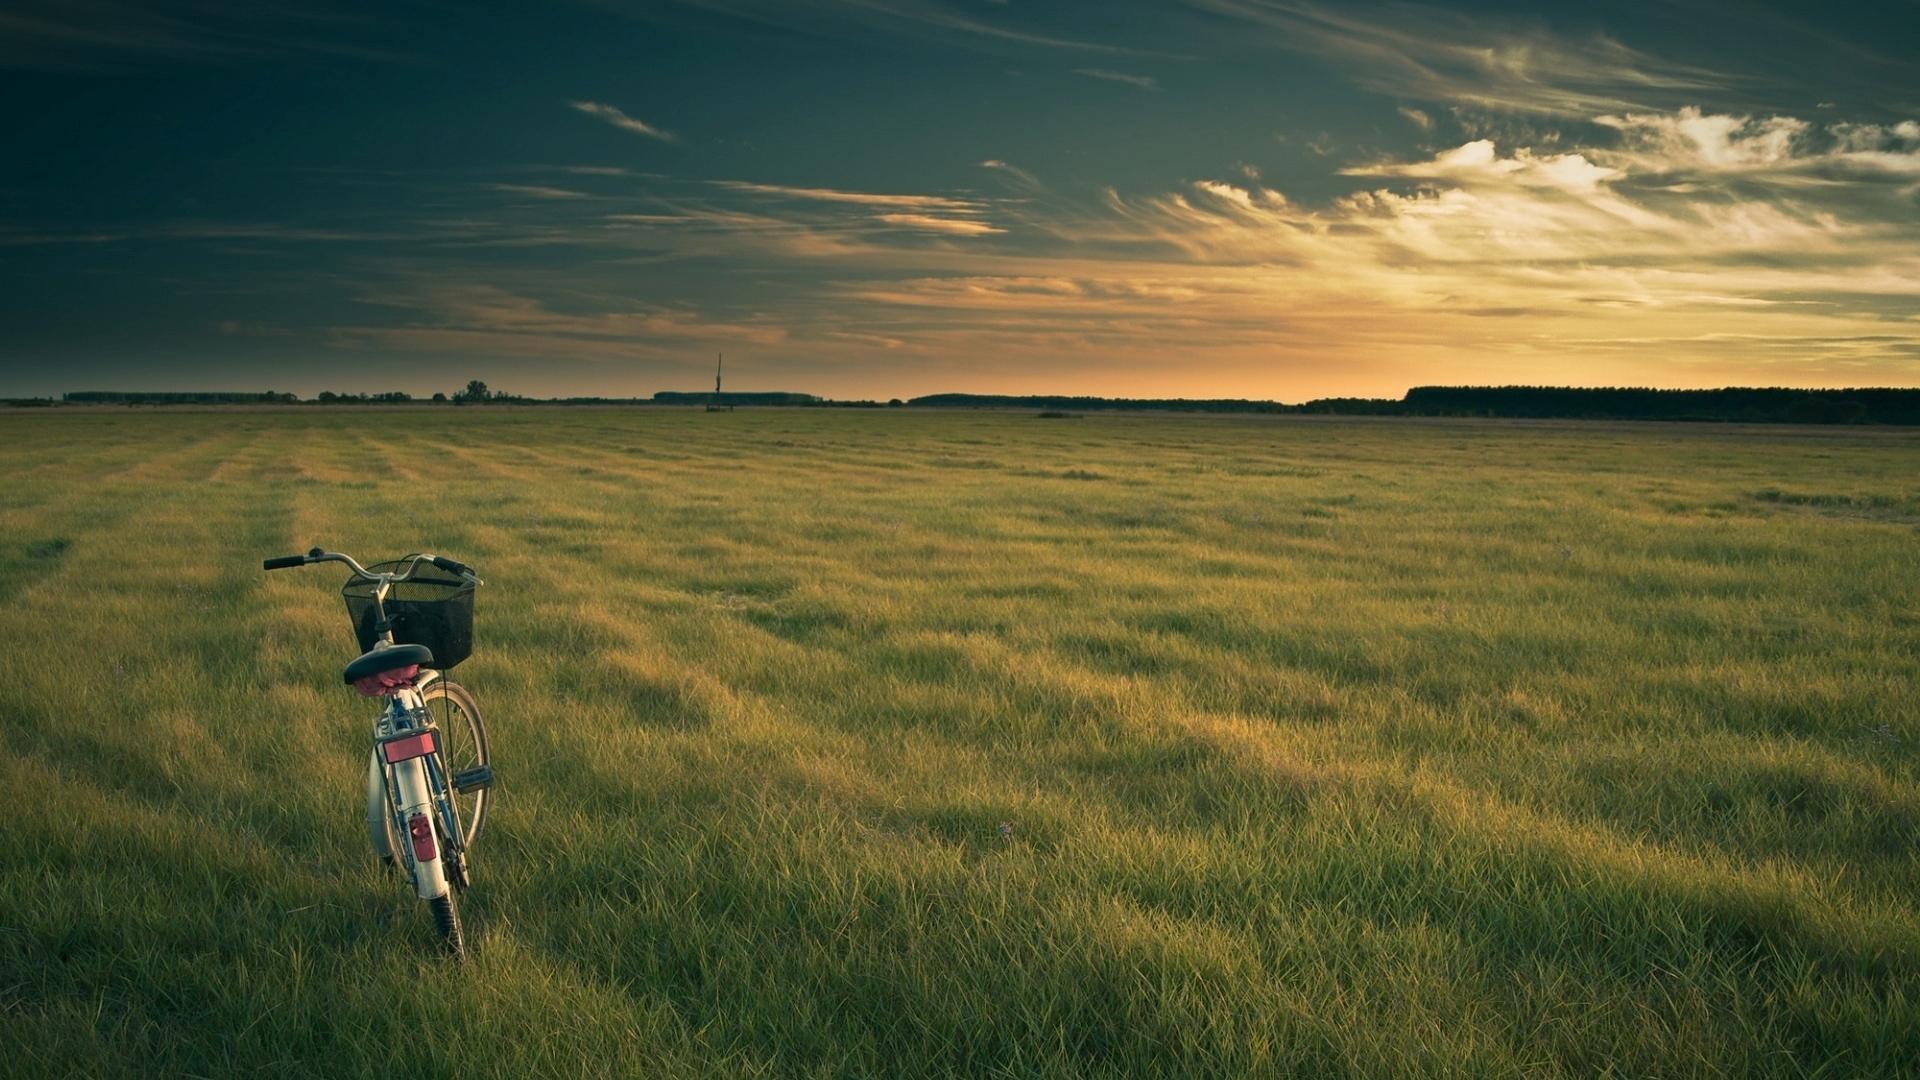 Wallpaper Bicycle Field Grass Evening